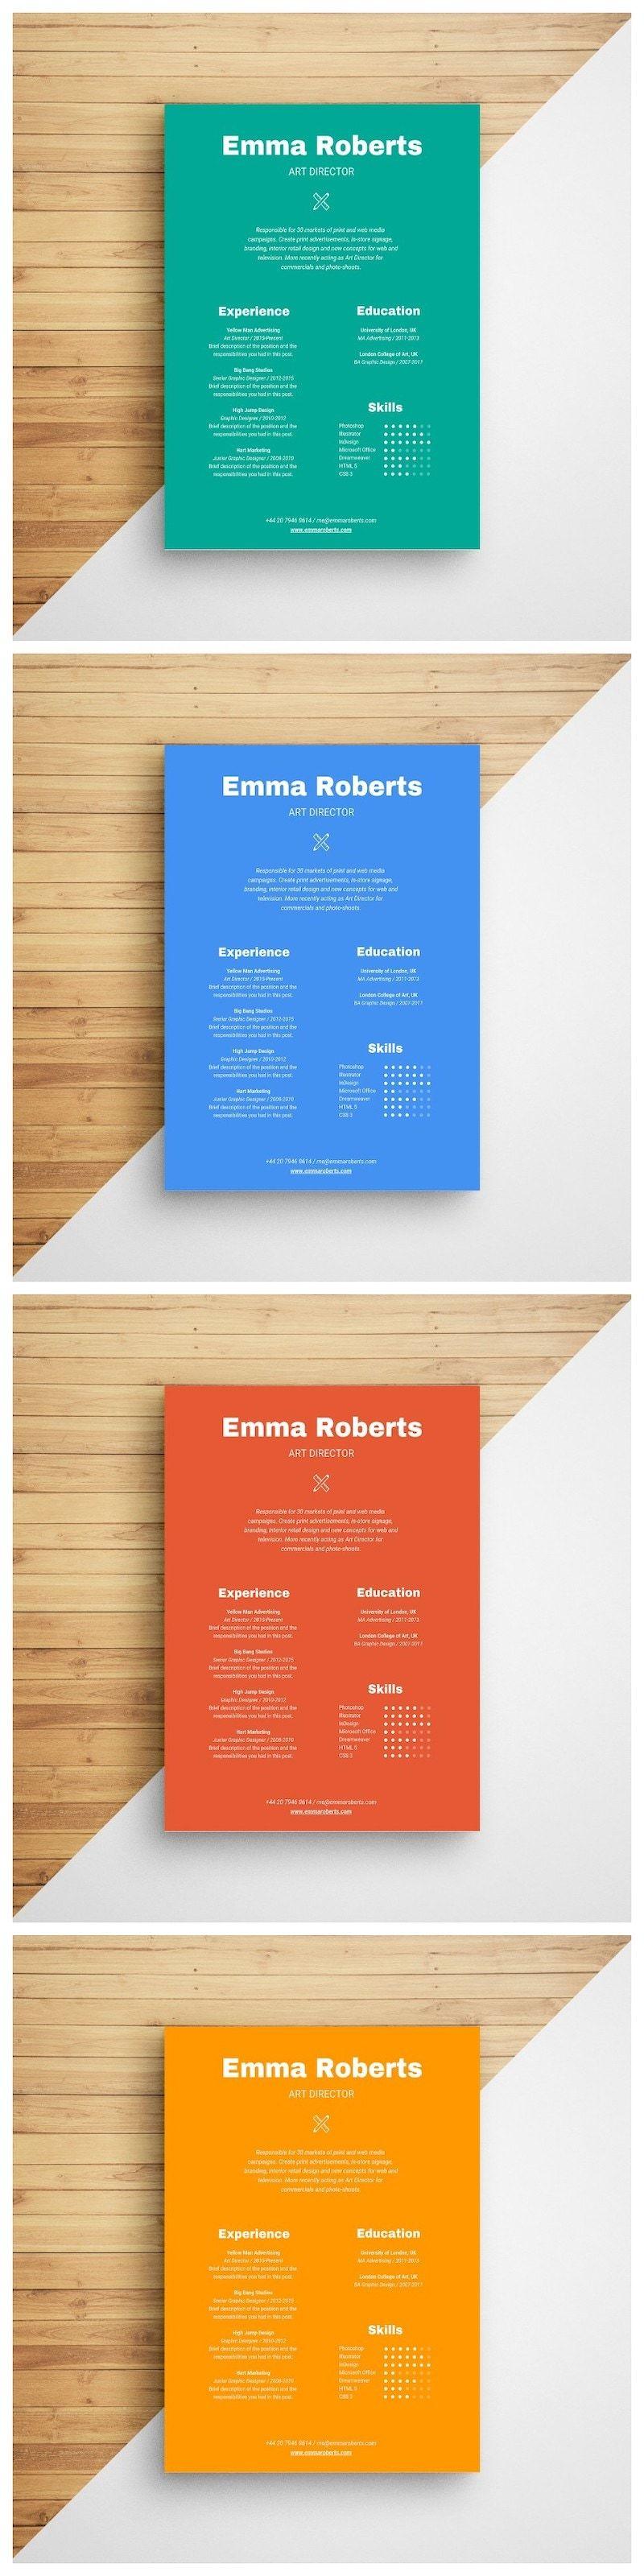 Colorful resume resume design infographic resume resume